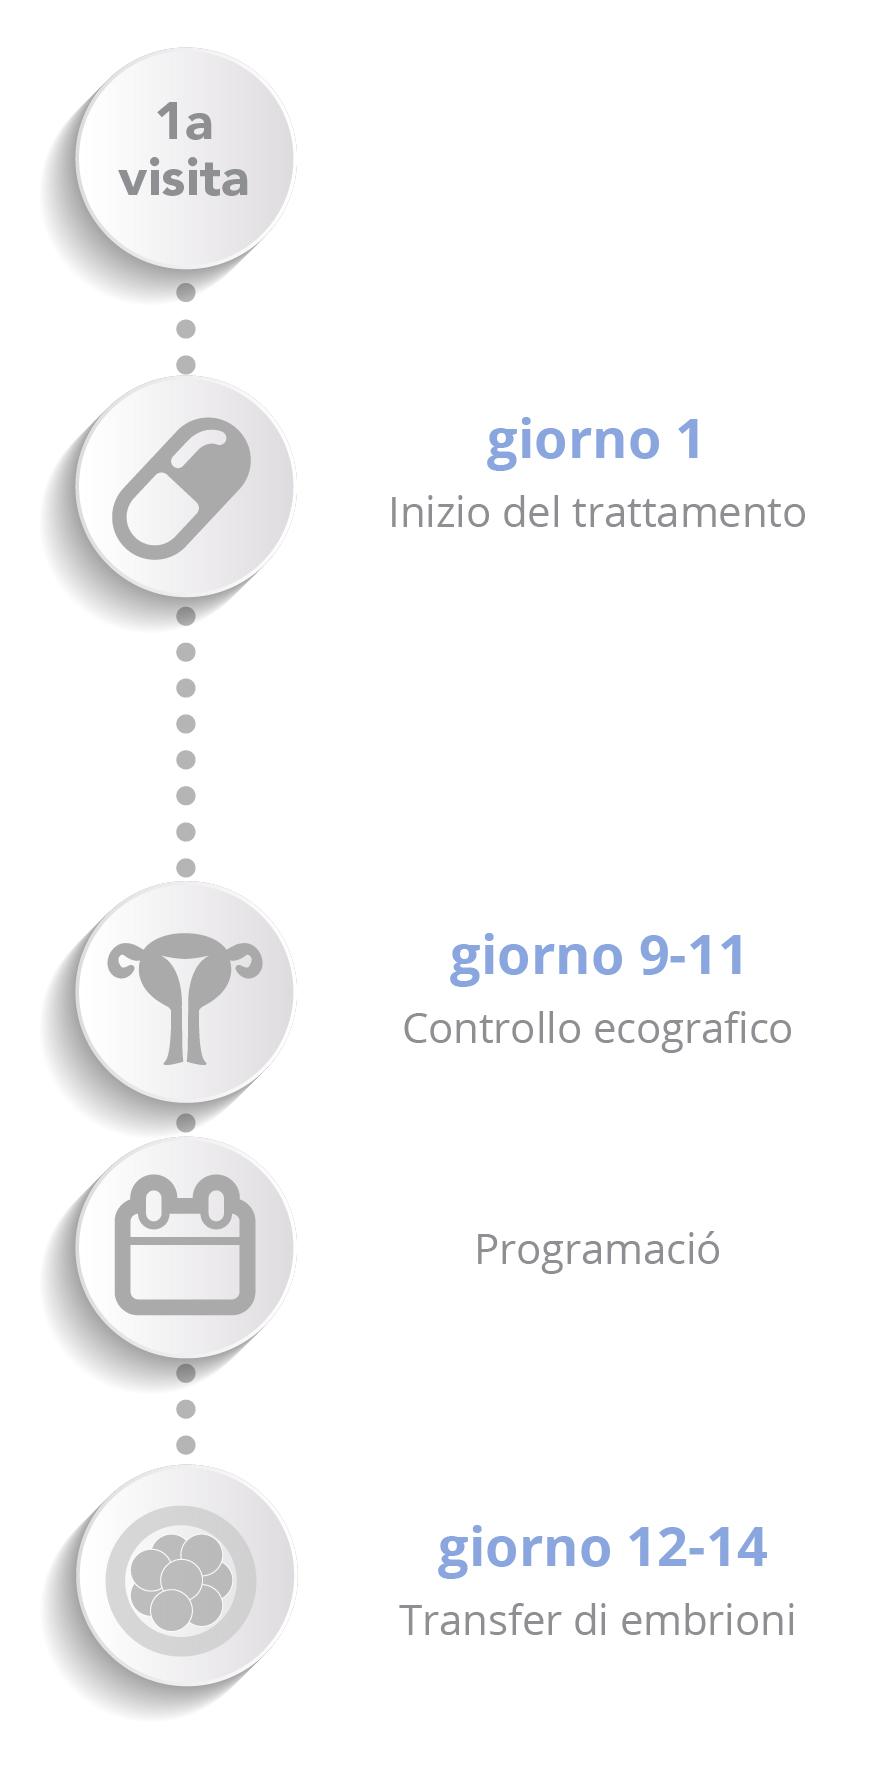 Donazione di embrioni - Schema verticale